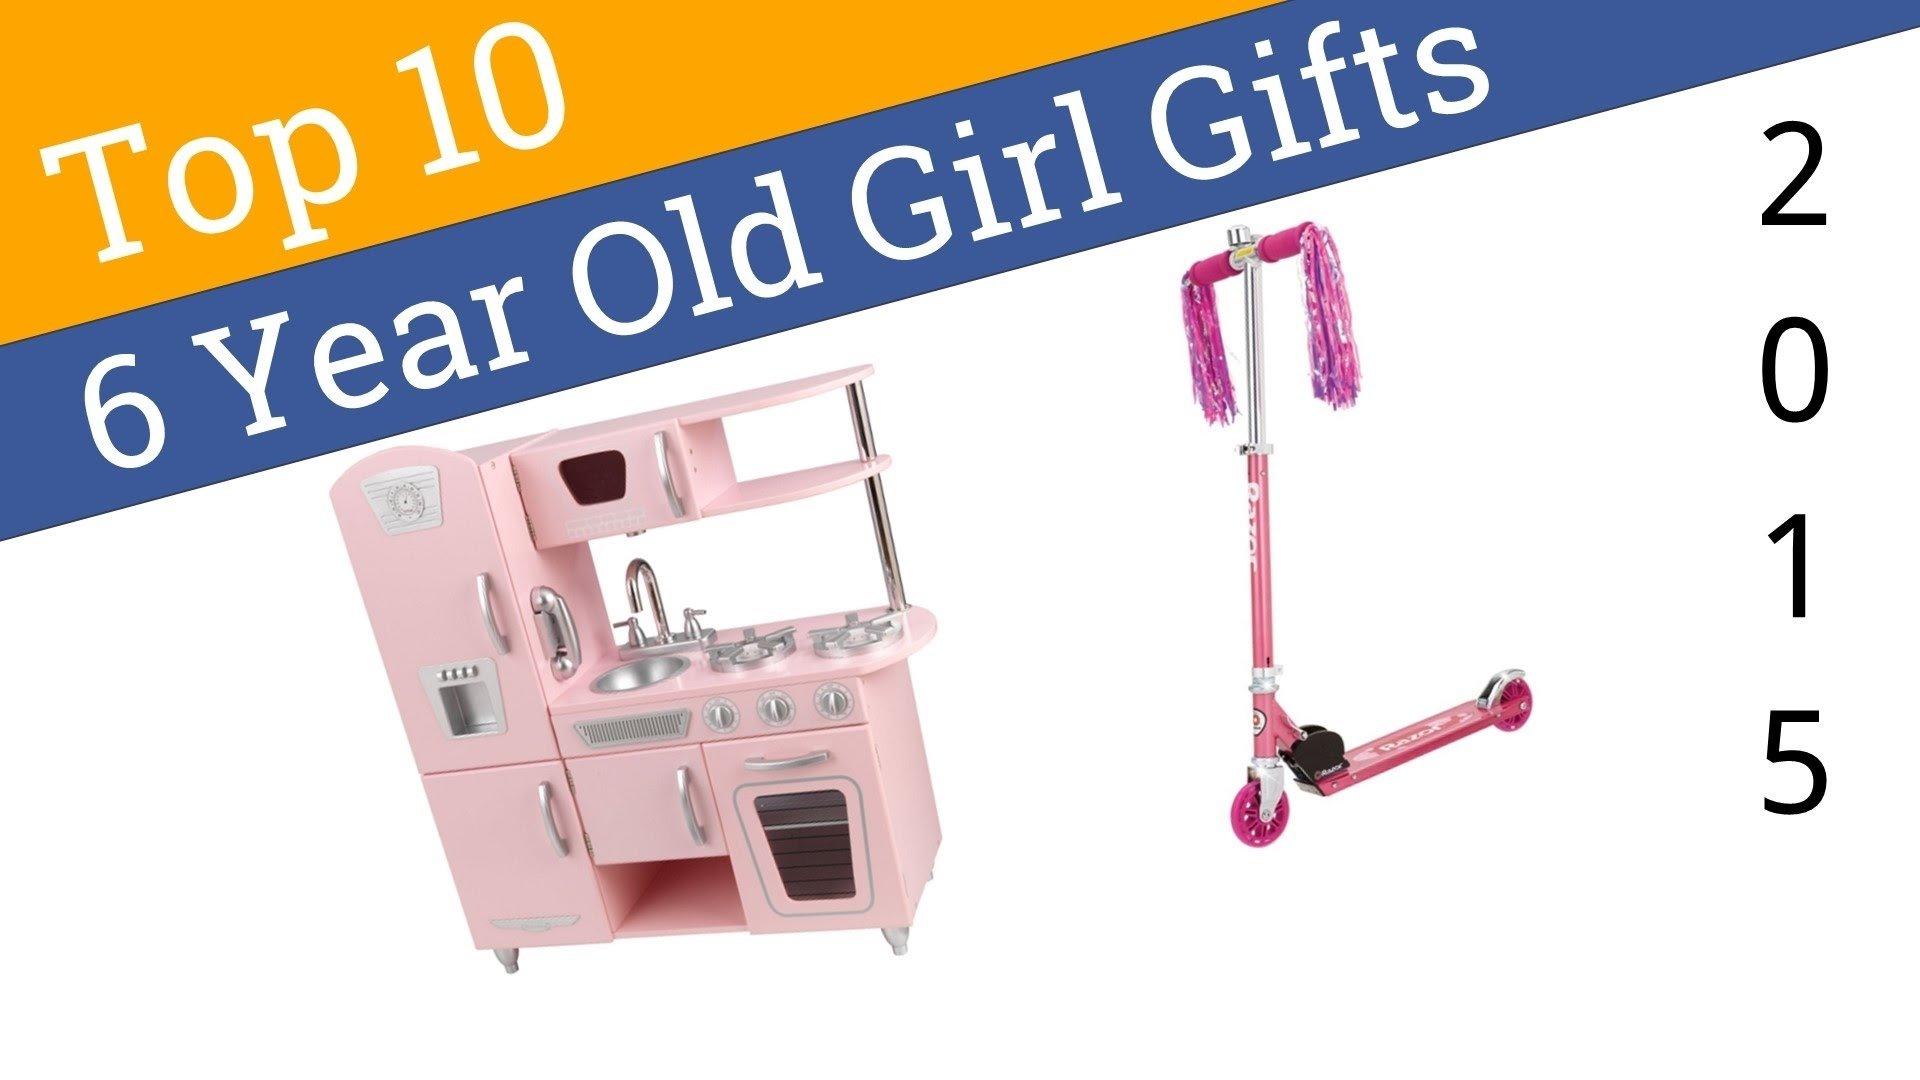 10 Great Gift Ideas 6 Year Old Girl Themes Birthday Yr